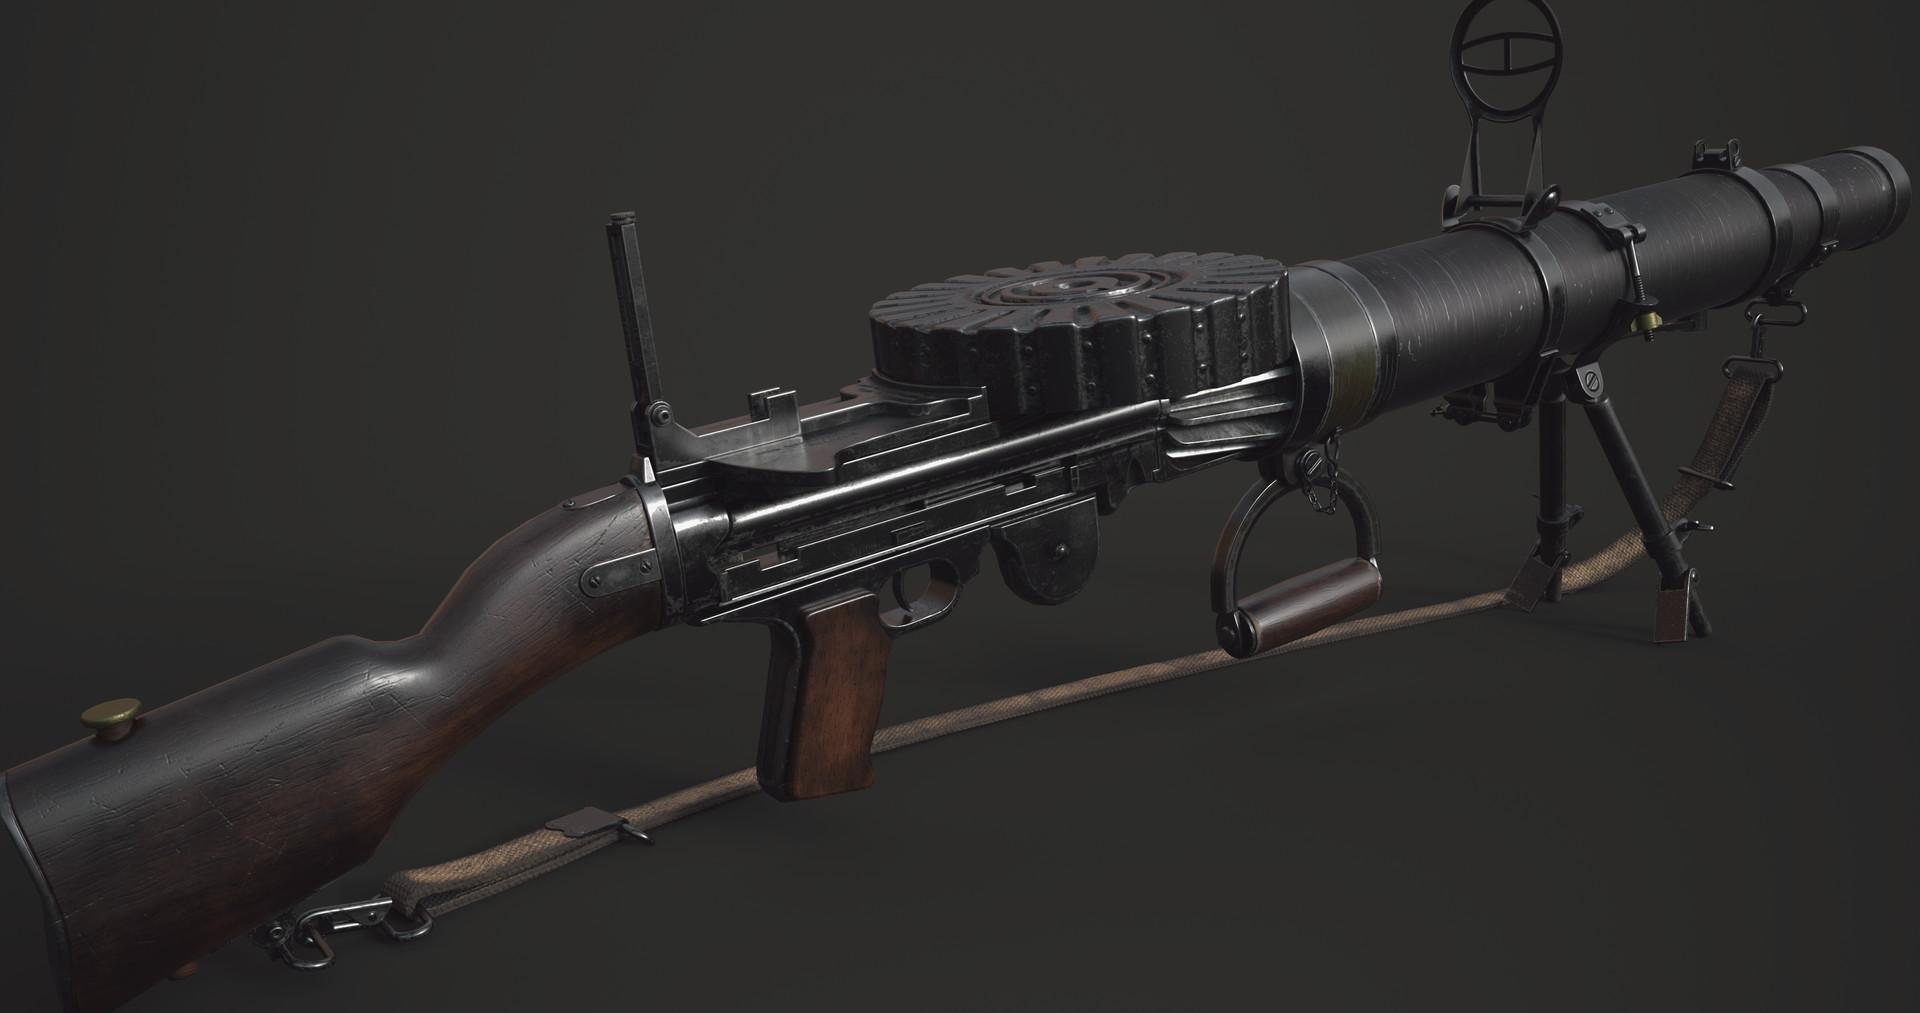 Пулемет льюиса картинки